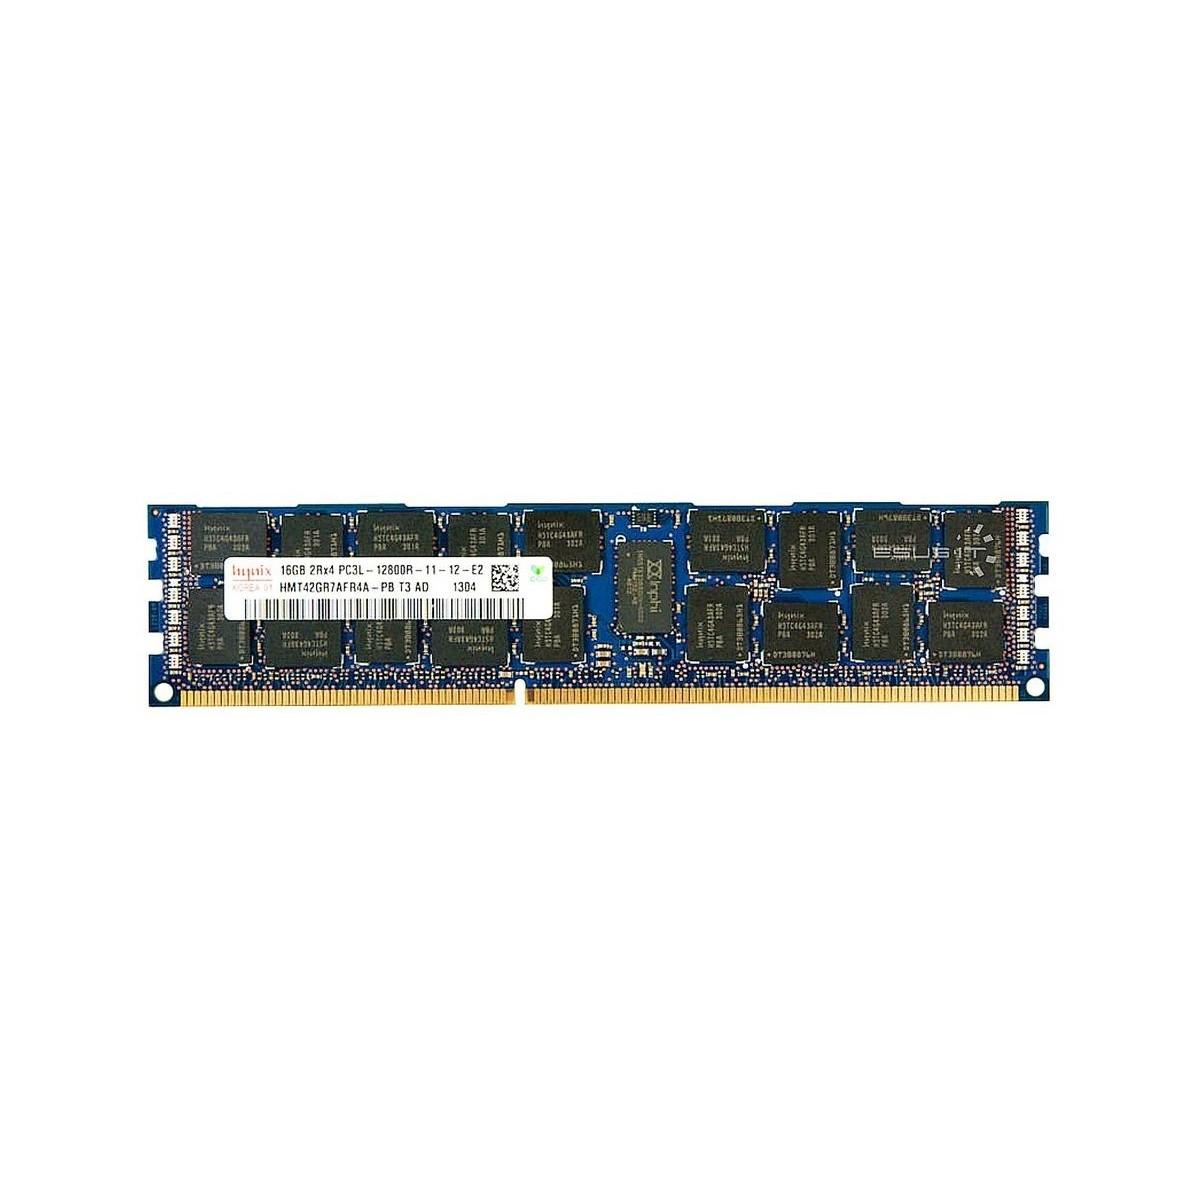 HYNIX 16GB 2Rx4 PC3L-12800R HMT42GR7AFR4A-PB